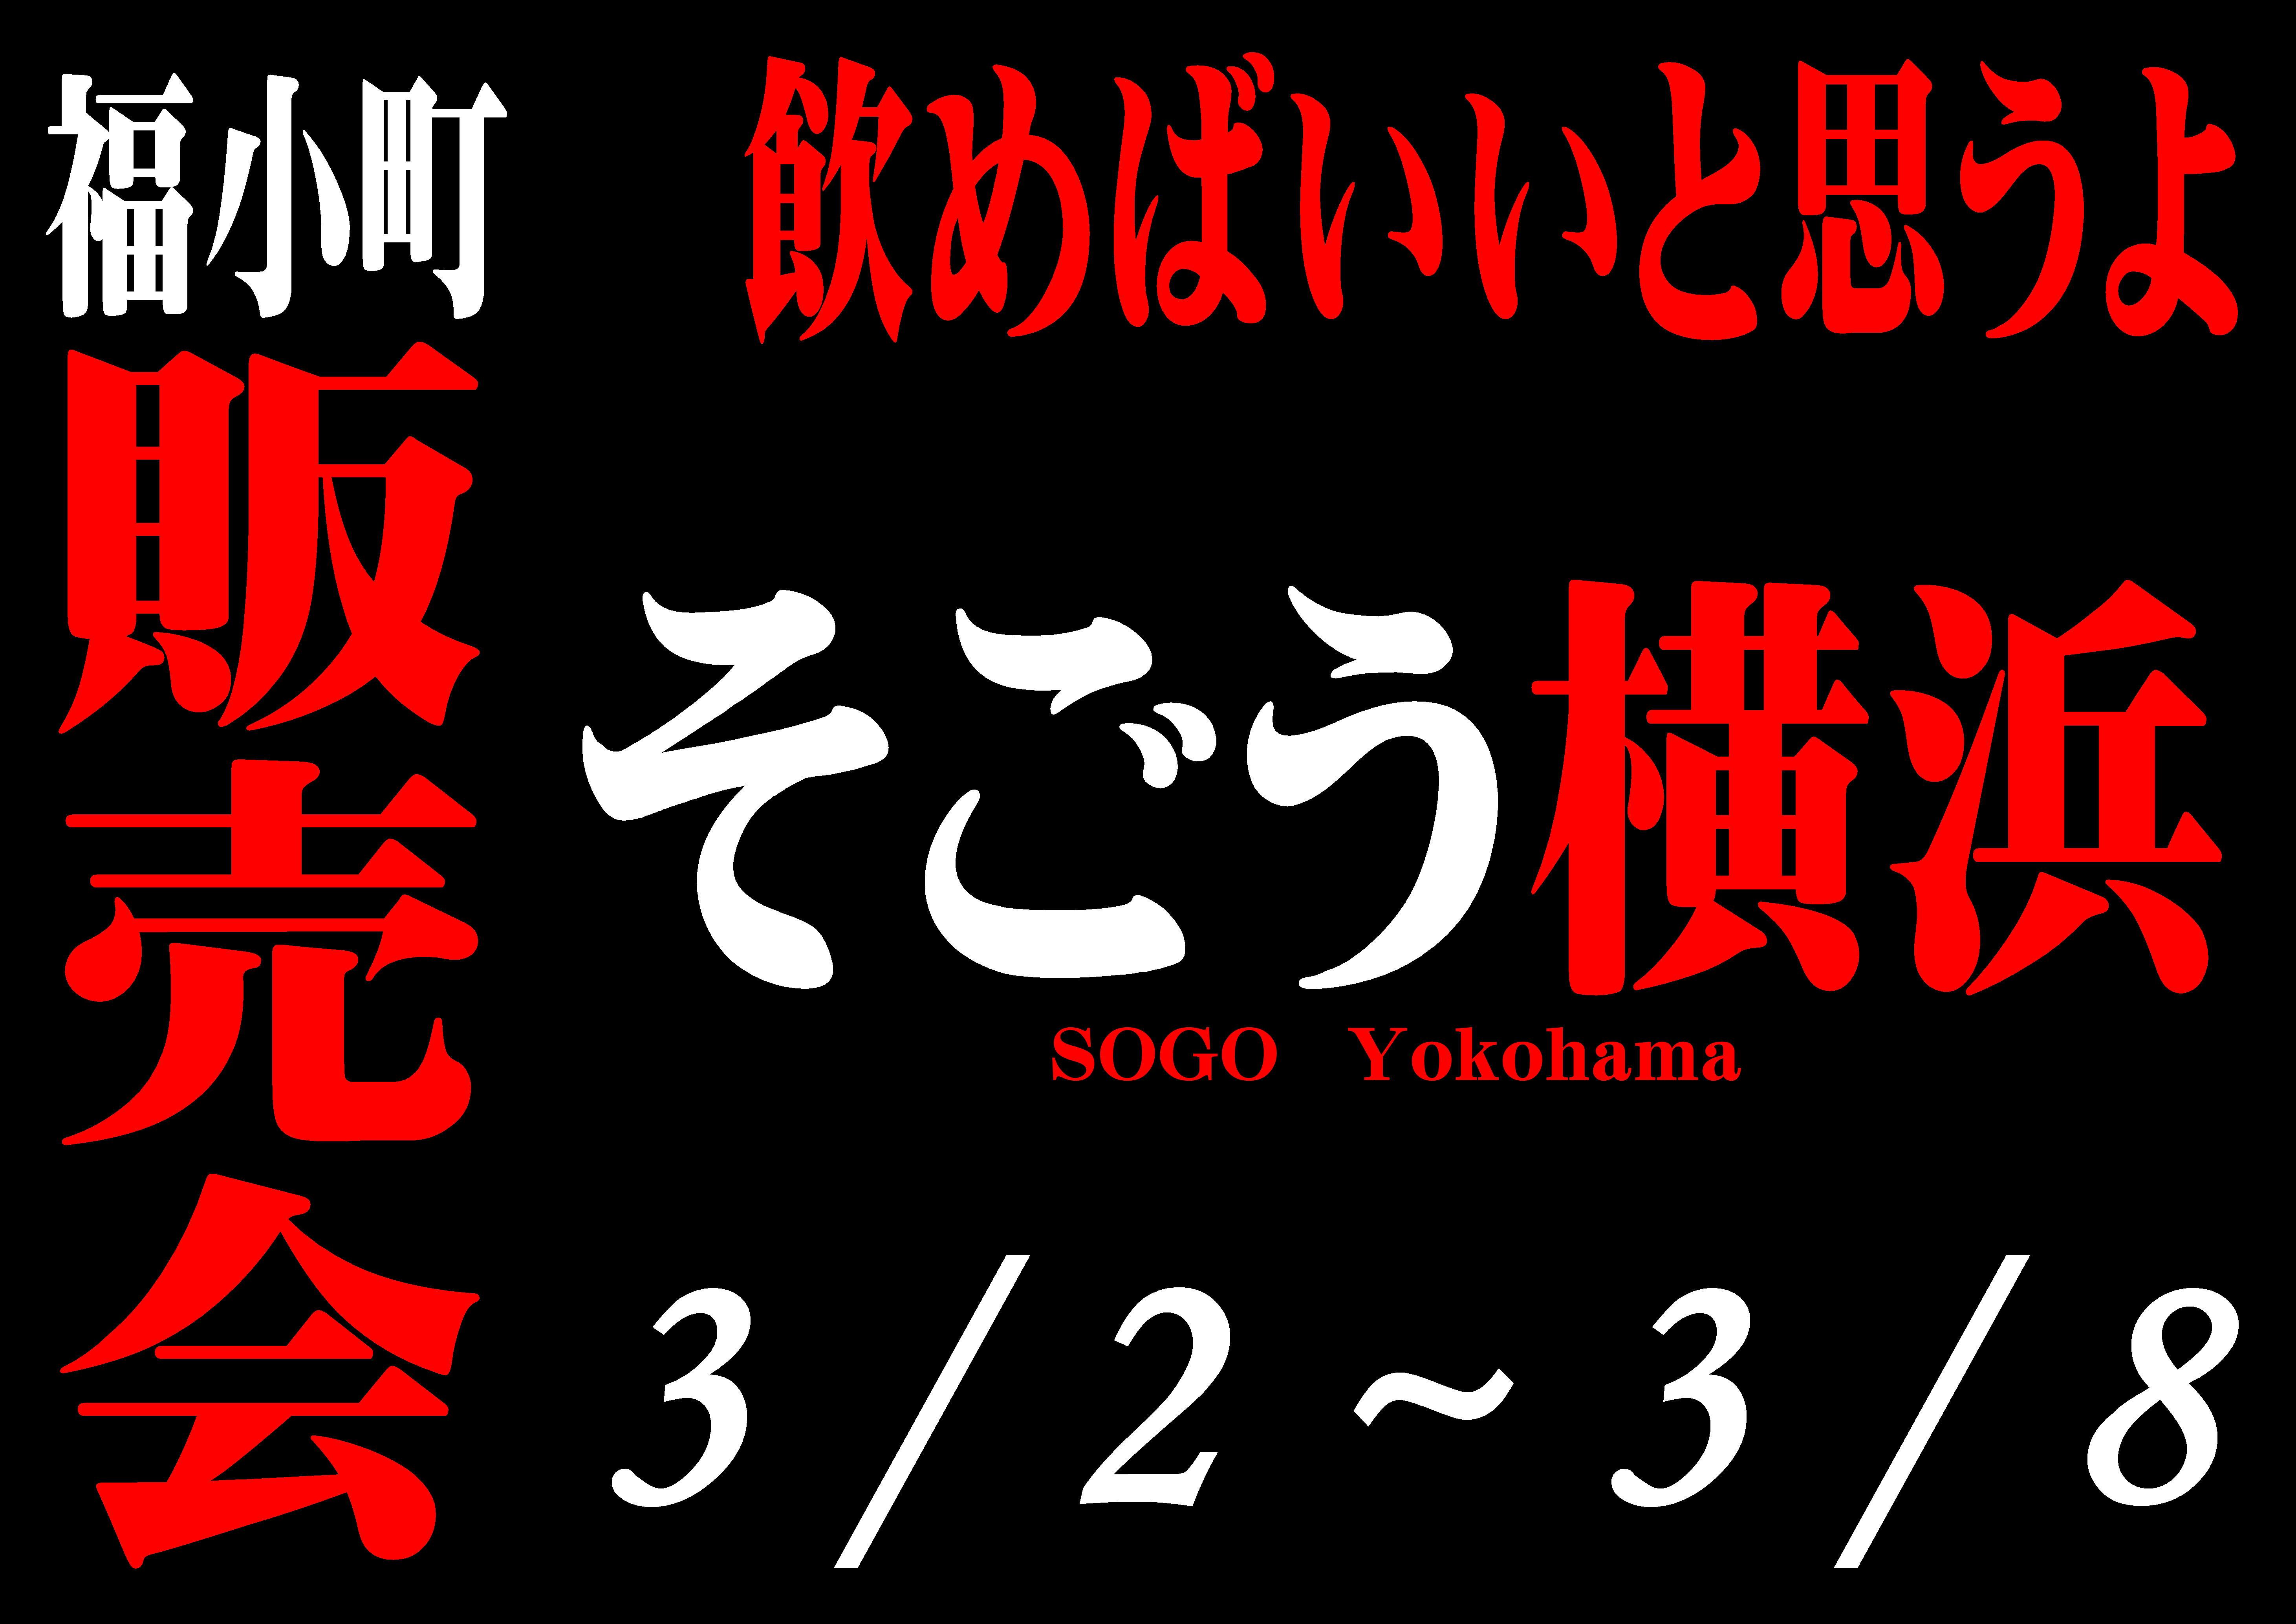 http://www.fukukomachi.com/blog/photo/20210301.JPG